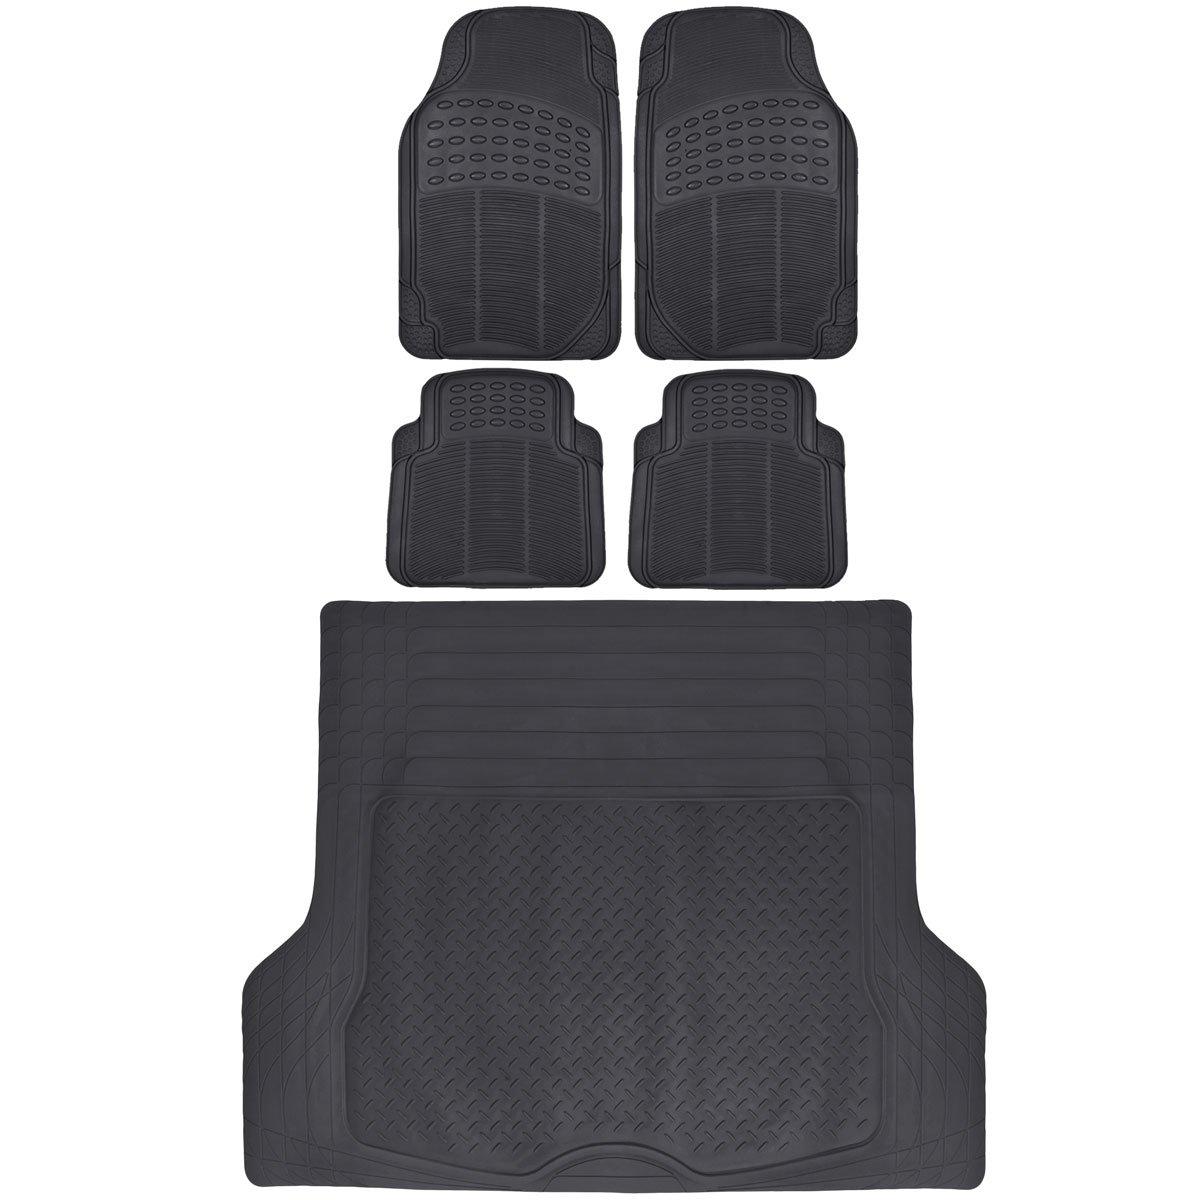 BDK Black Cargo Rubber Car Floor Mats All Weather Heavy Duty Set 5 pcs